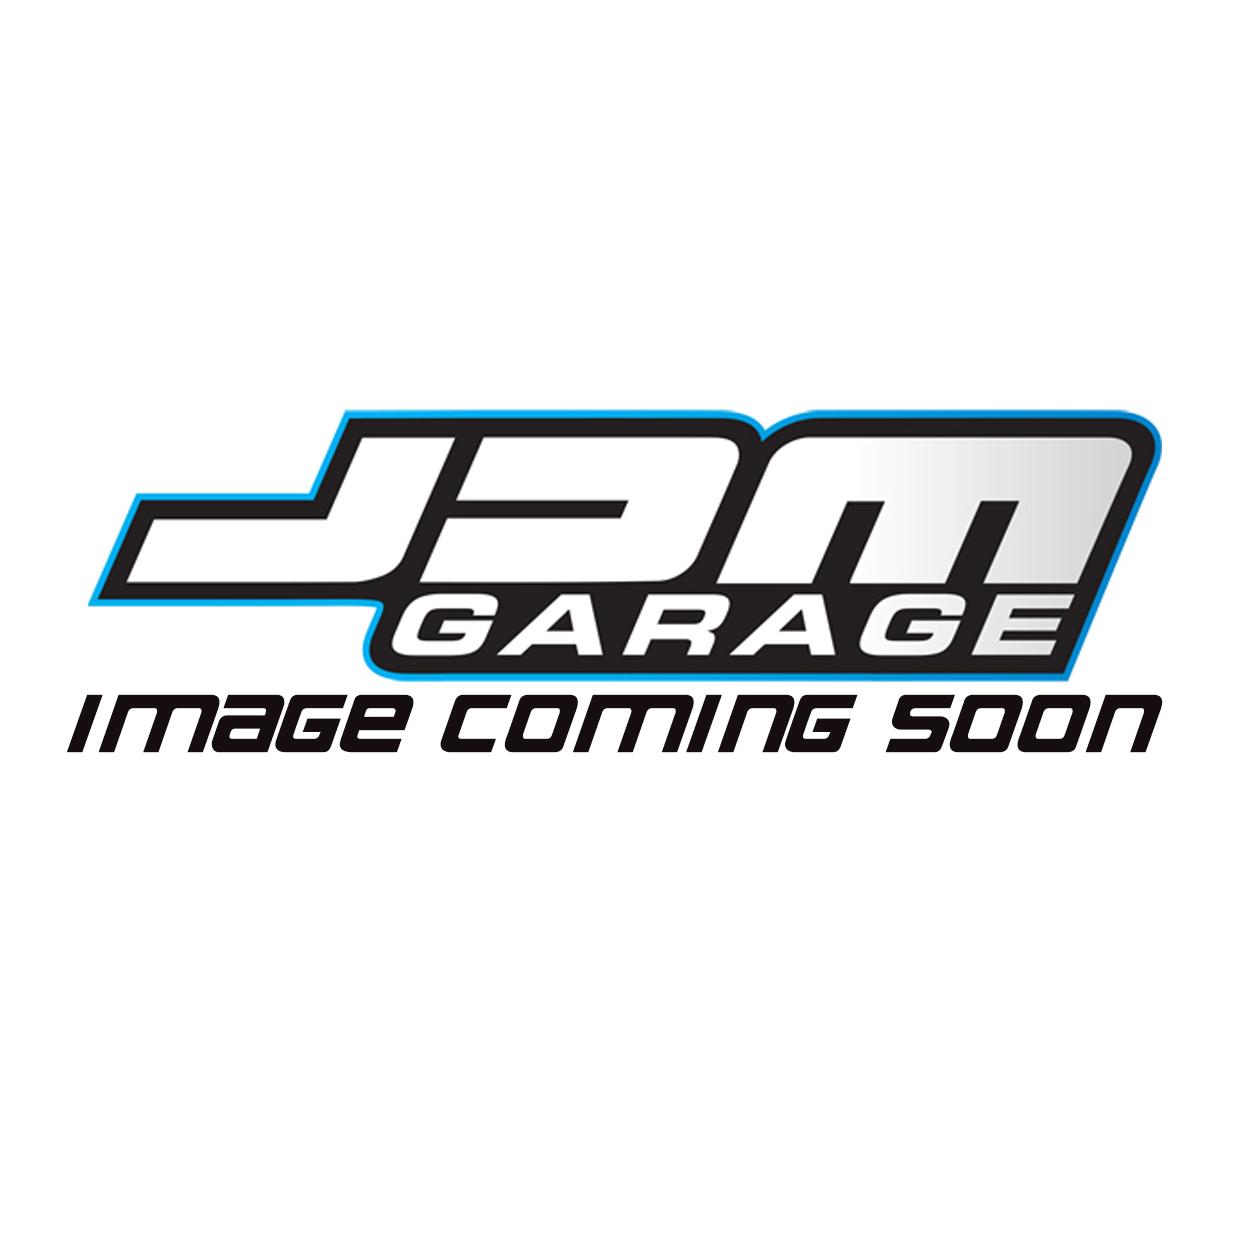 Nissan Skyline RB25DET Throttle Body Adapter for Greddy Inlet Manifold